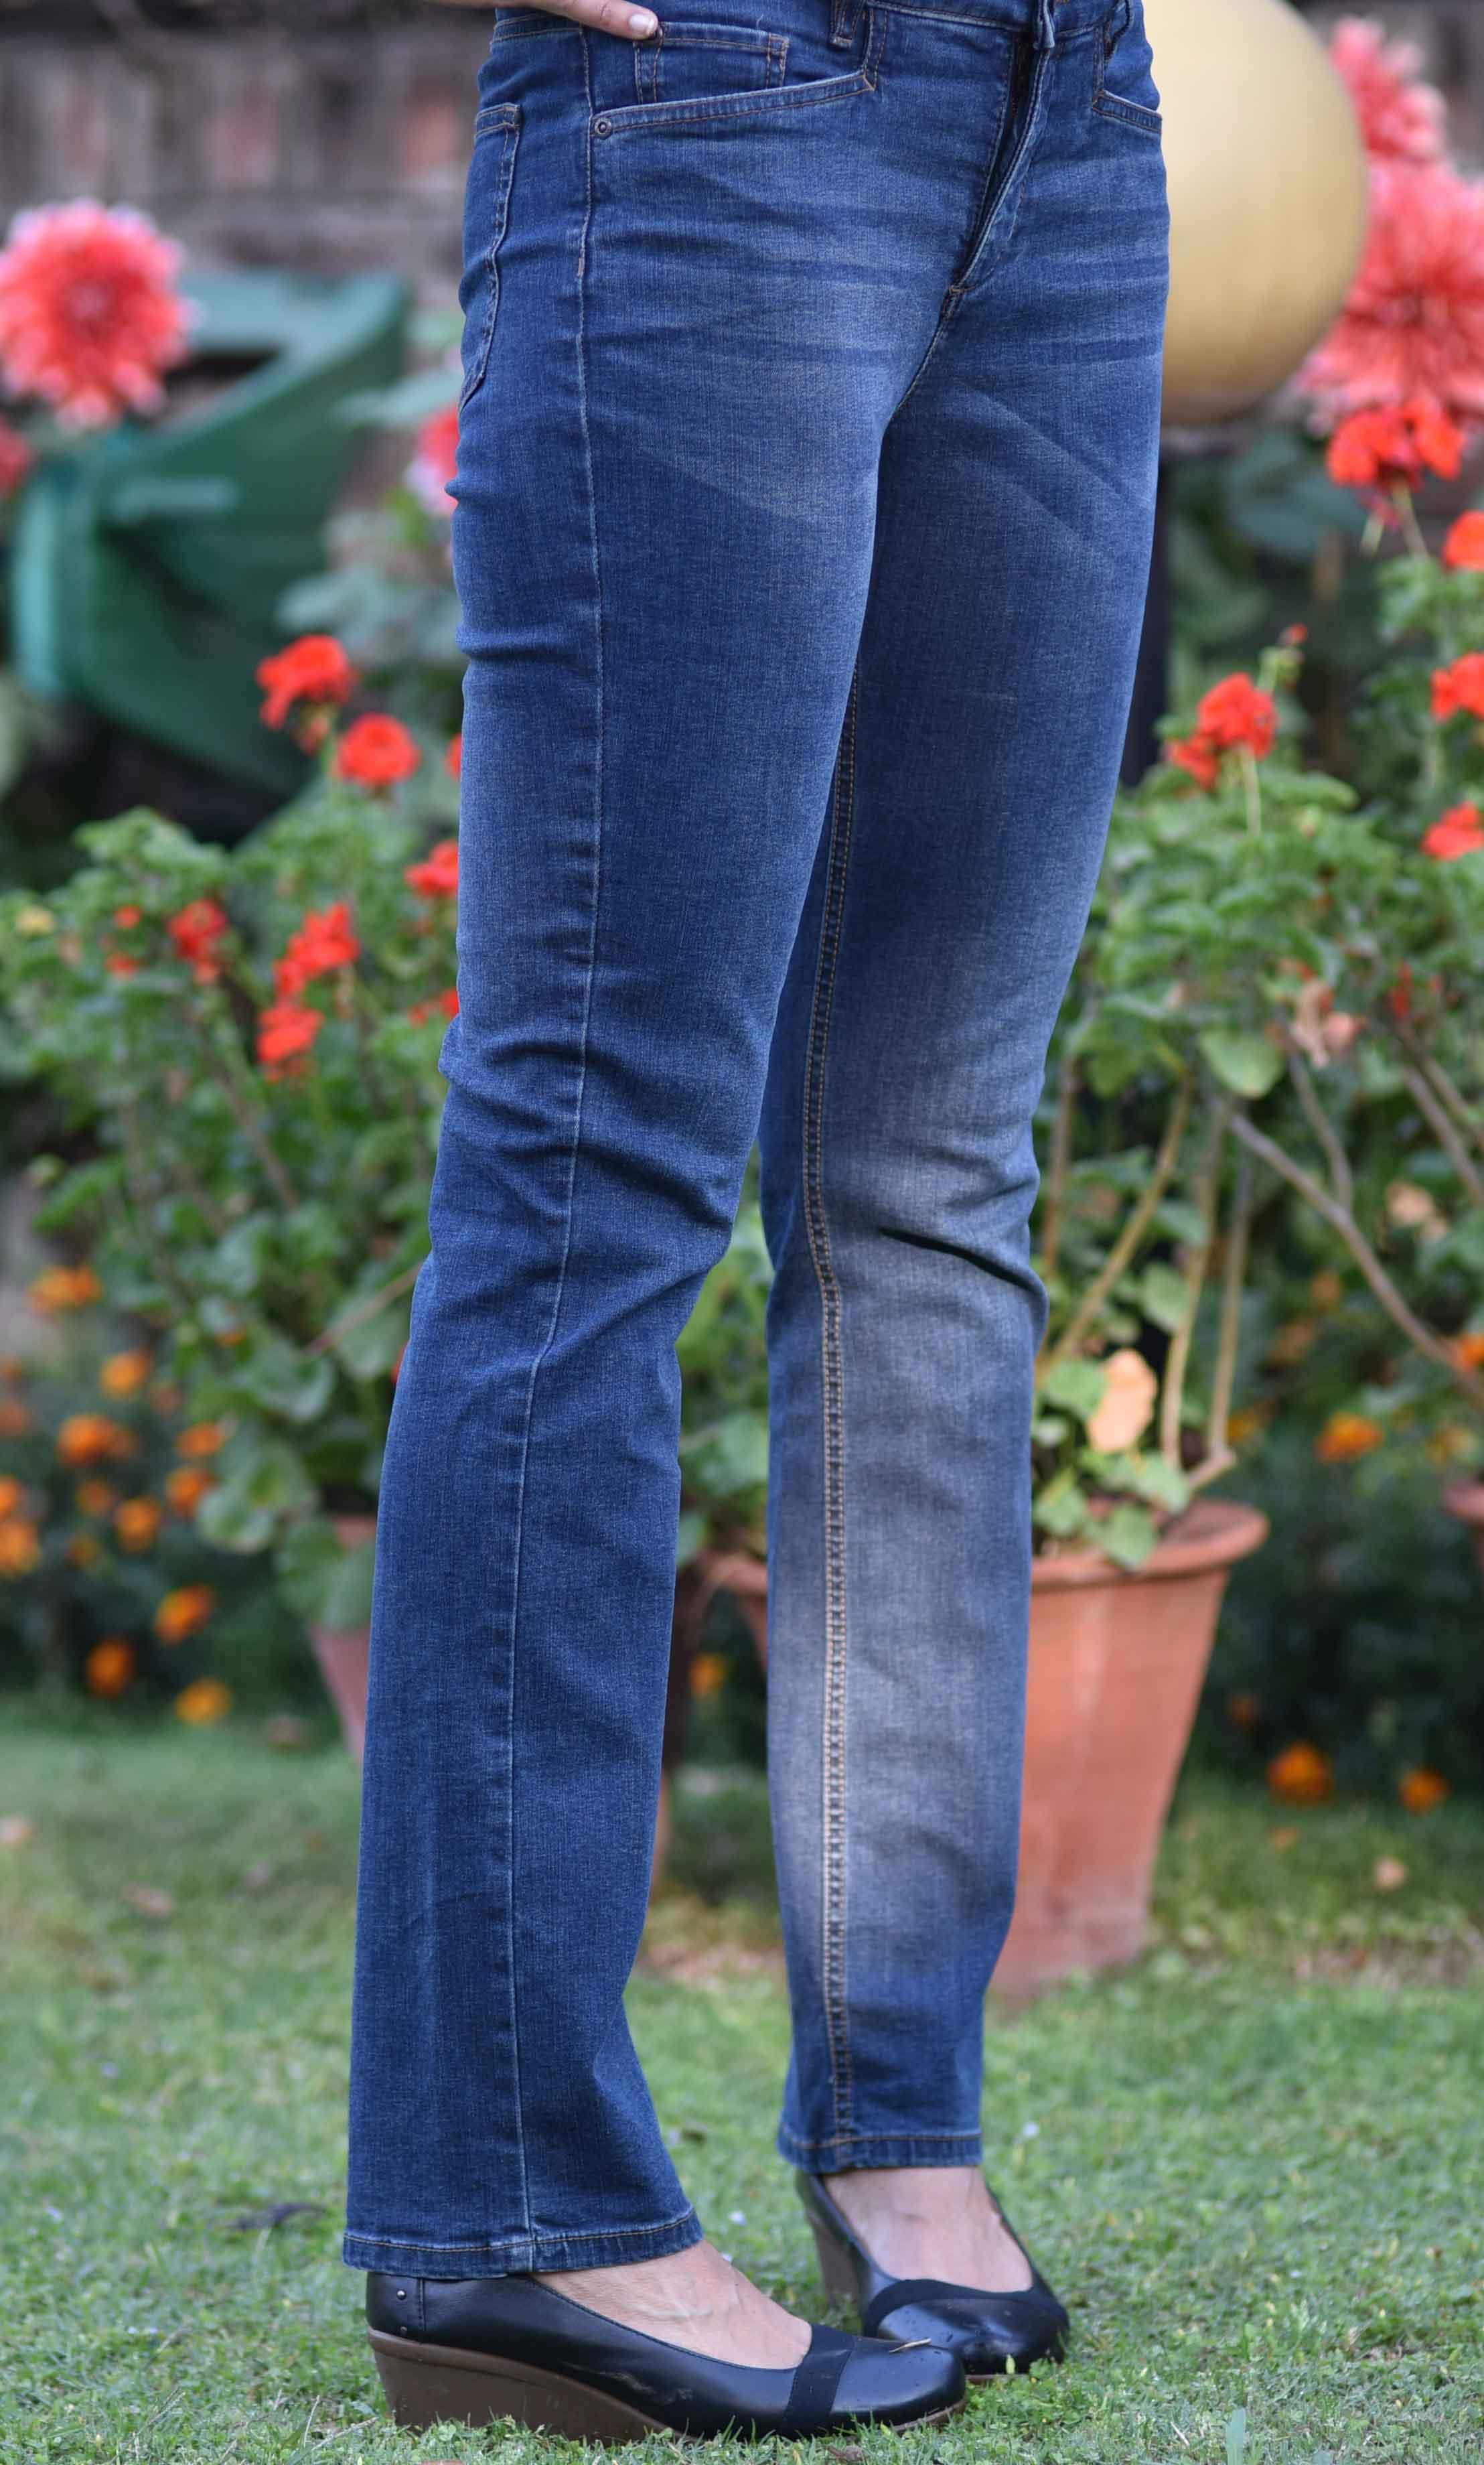 The JJill Smooth Fit Straight Leg Jeans are beautiful! Image©gunjanvirk